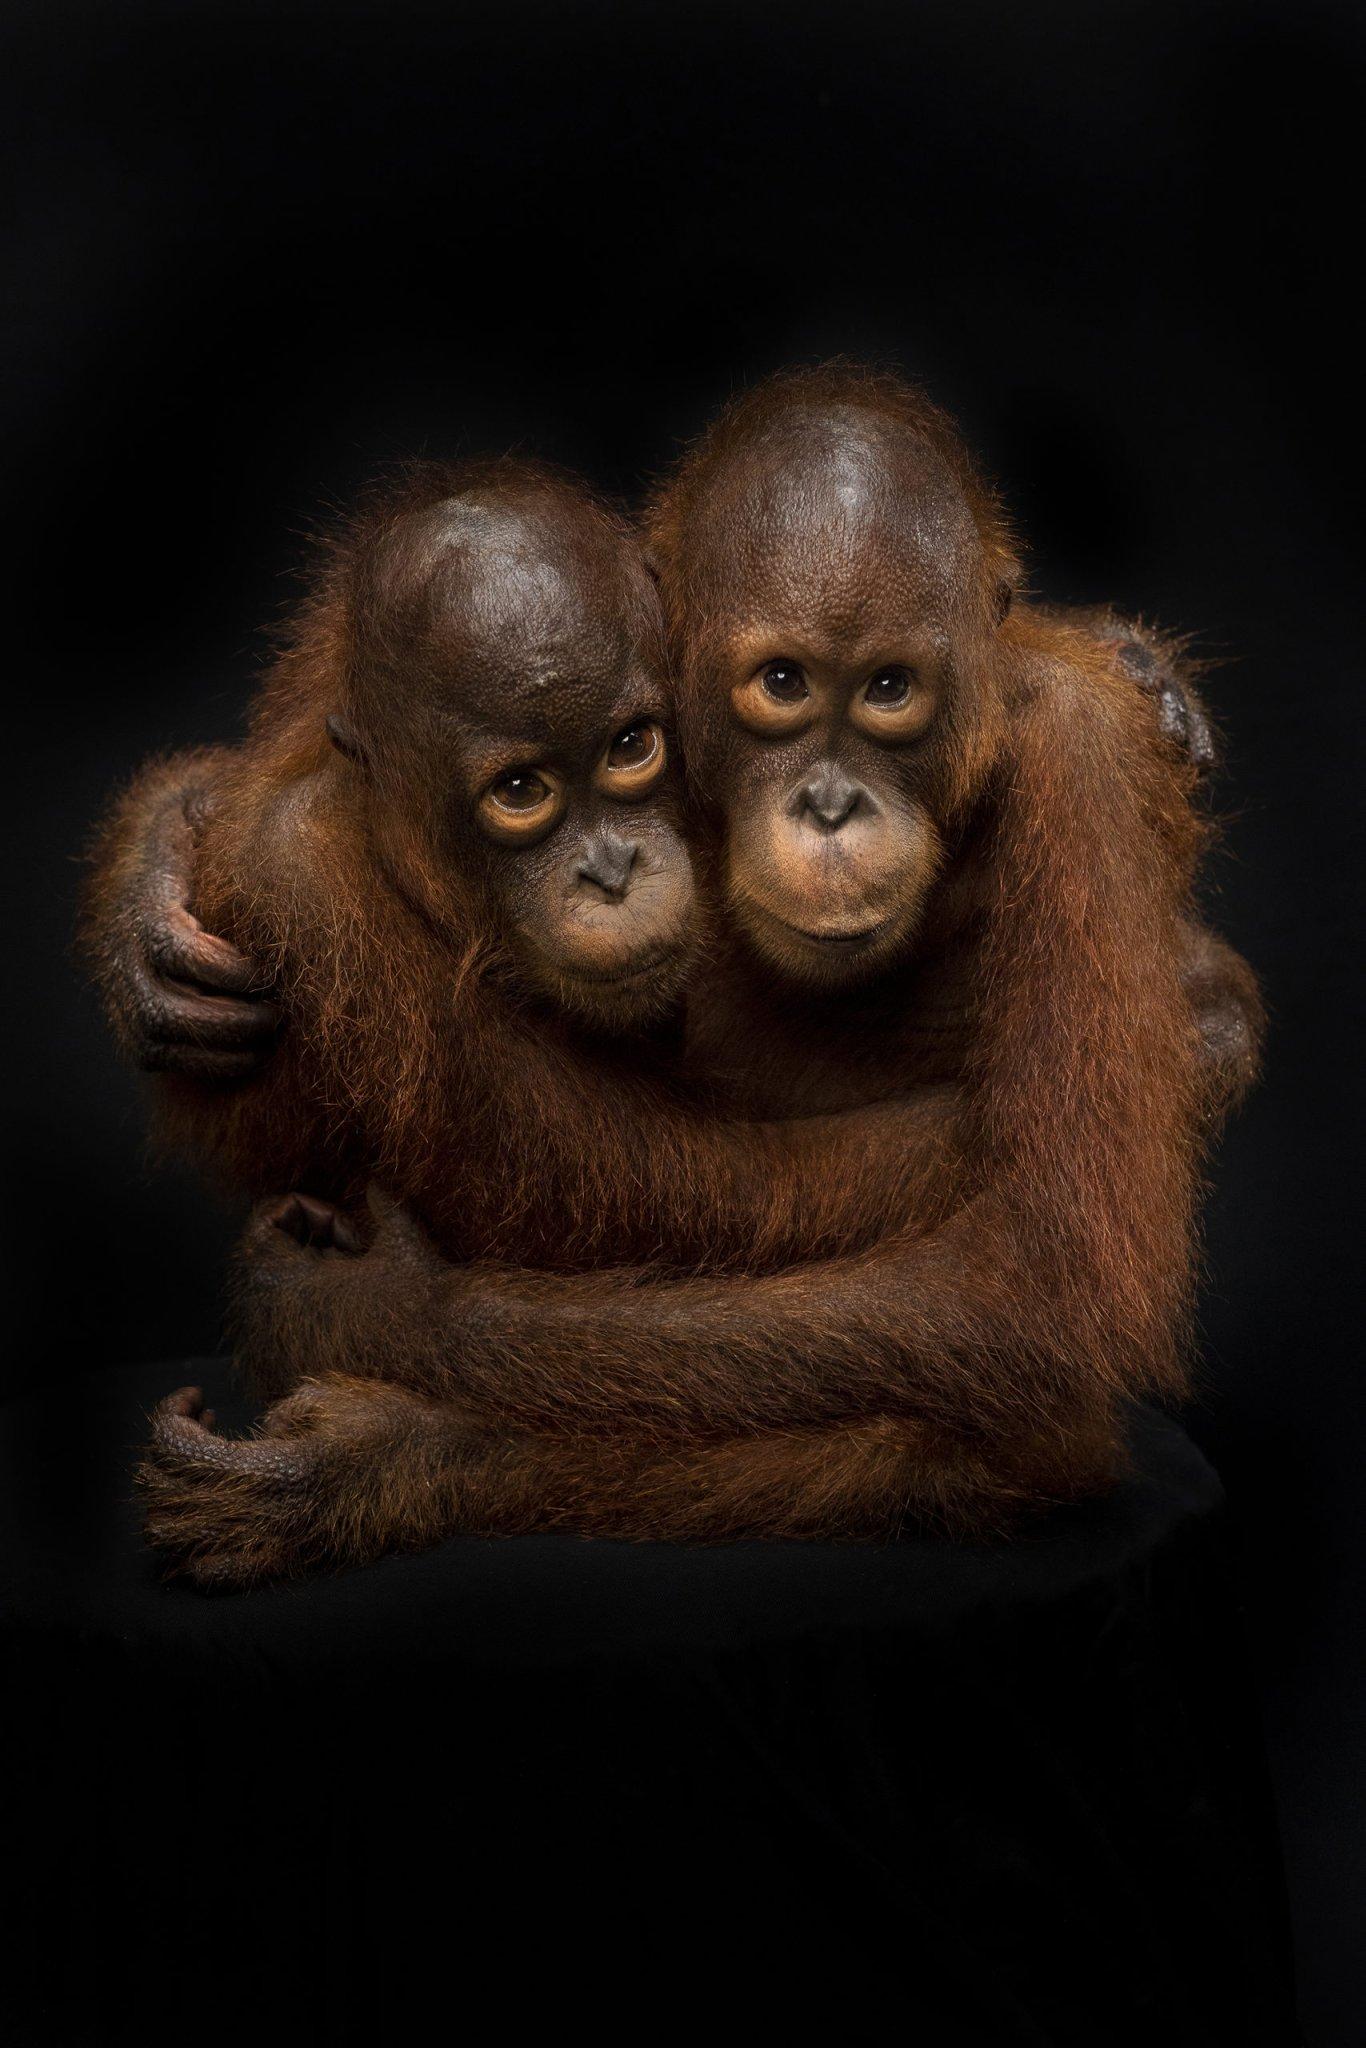 Mark Edward Harris' Beautiful Orangutan Portraits Highlight Deeper Issues